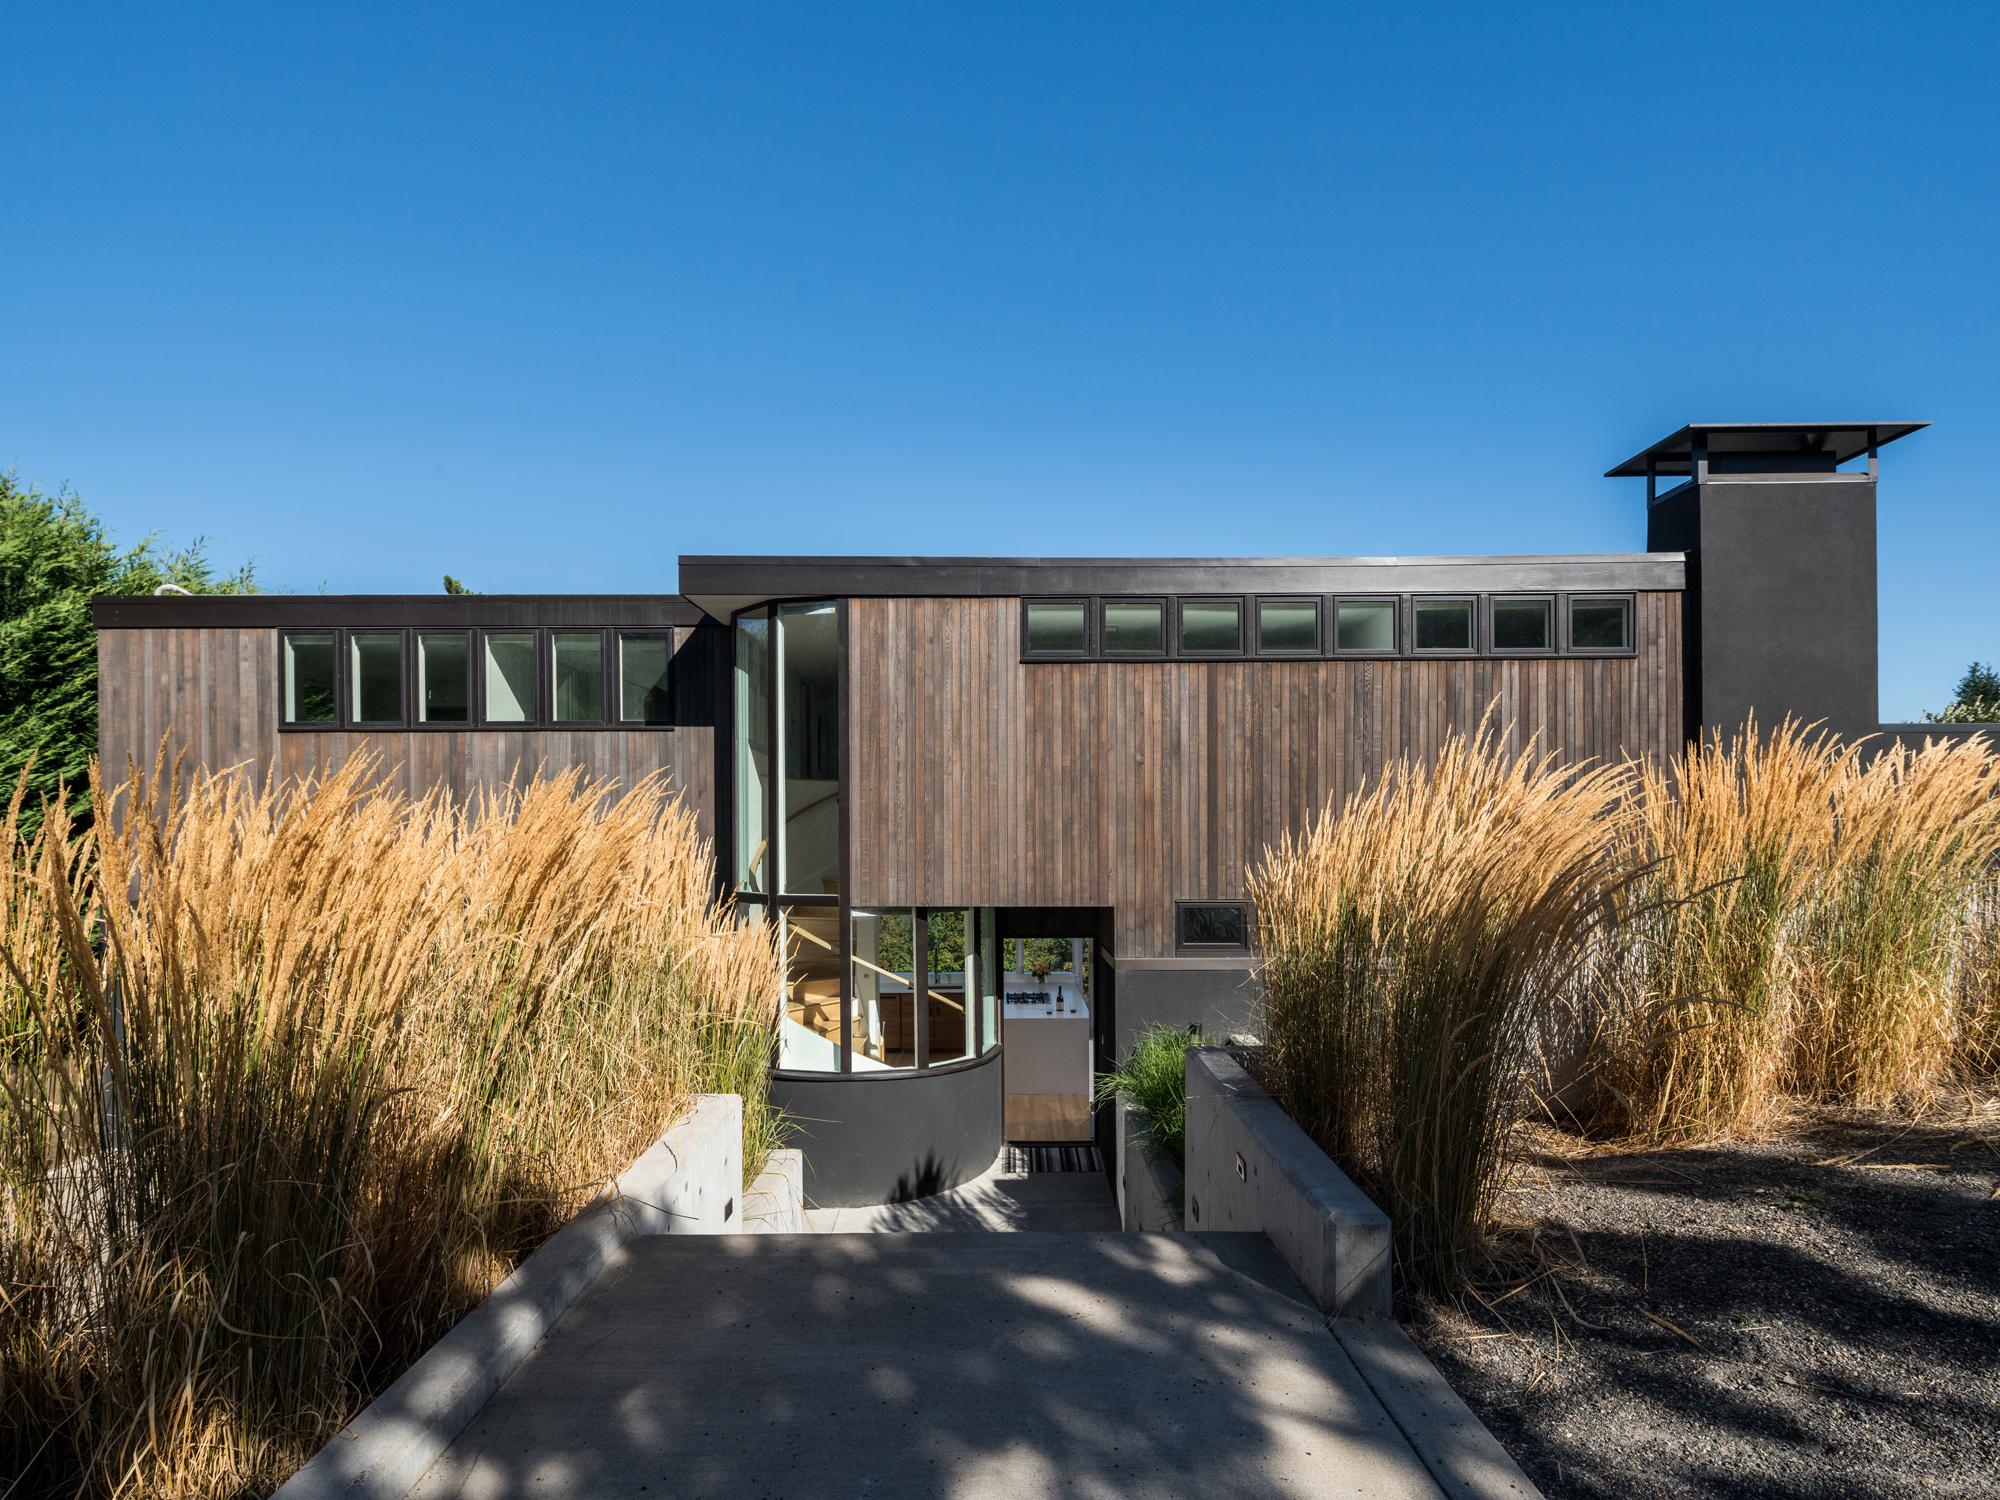 Van Evera Bailey Sinclair House by In Situ Architecture 01.jpg